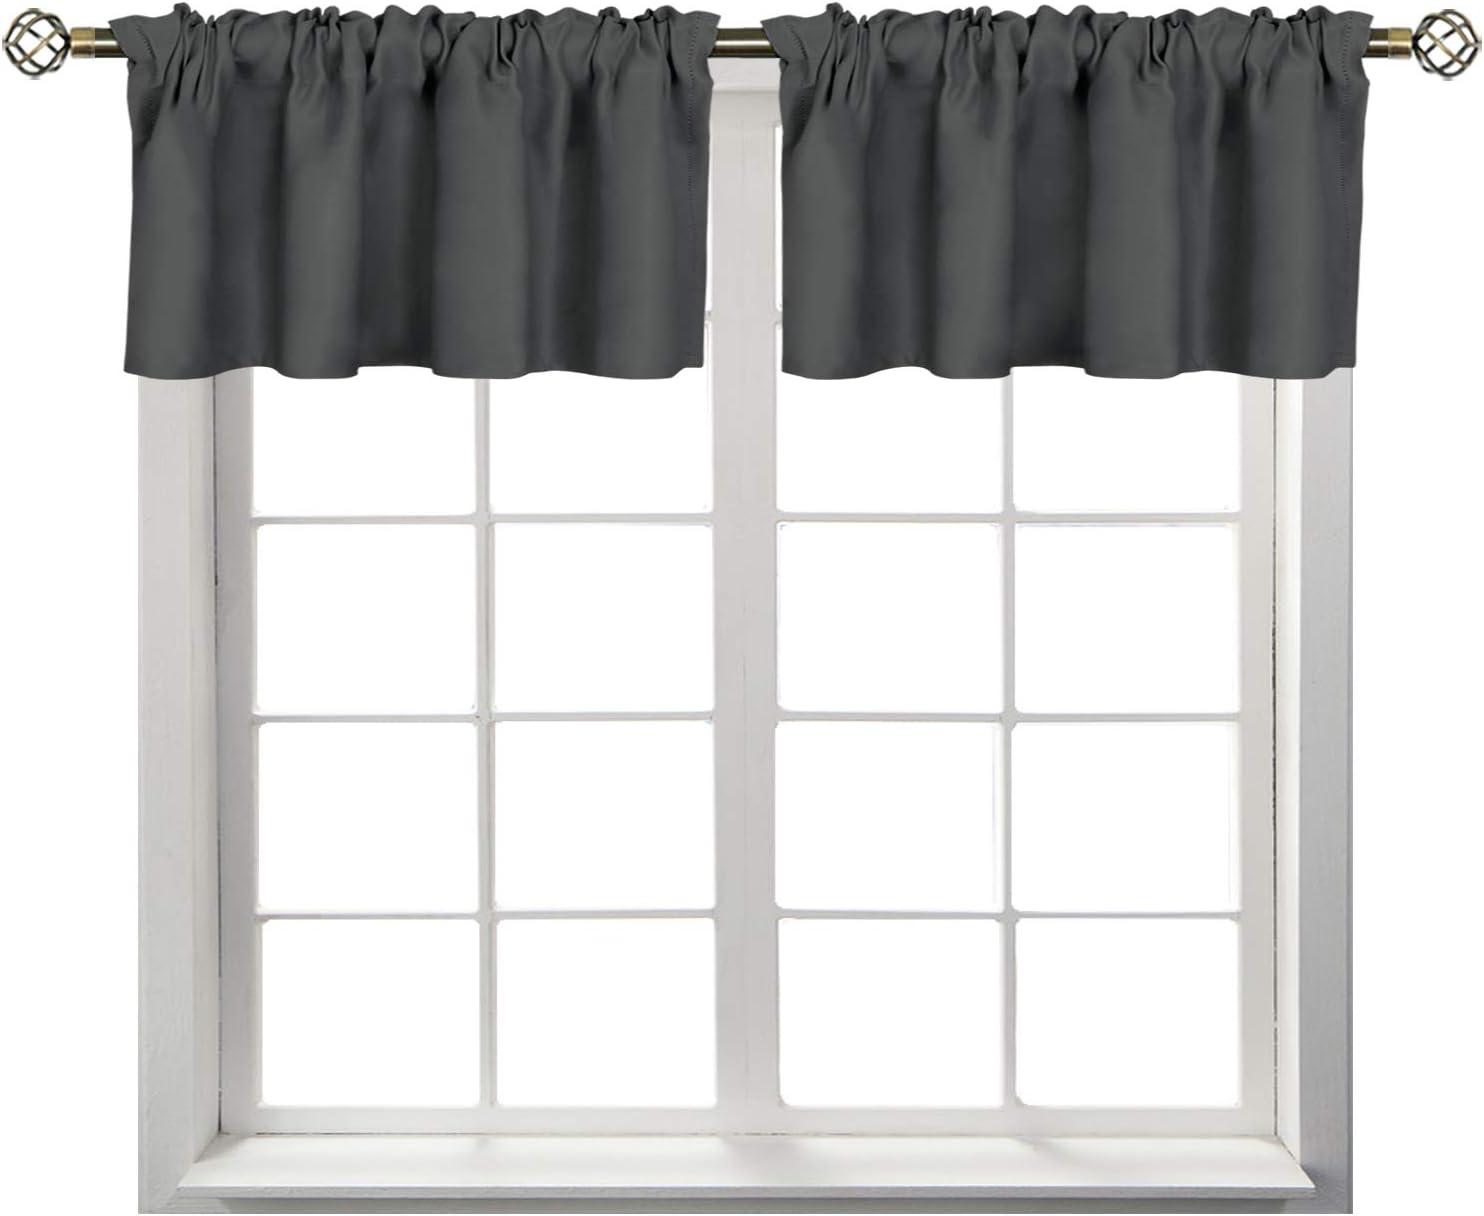 BGment Rod Pocket Valances for Kitchen- Thermal Insulated Room Darkening Tier Valance Curtain for Dinning Room, 42 x 18 Inch, 2 Panels, Dark Grey